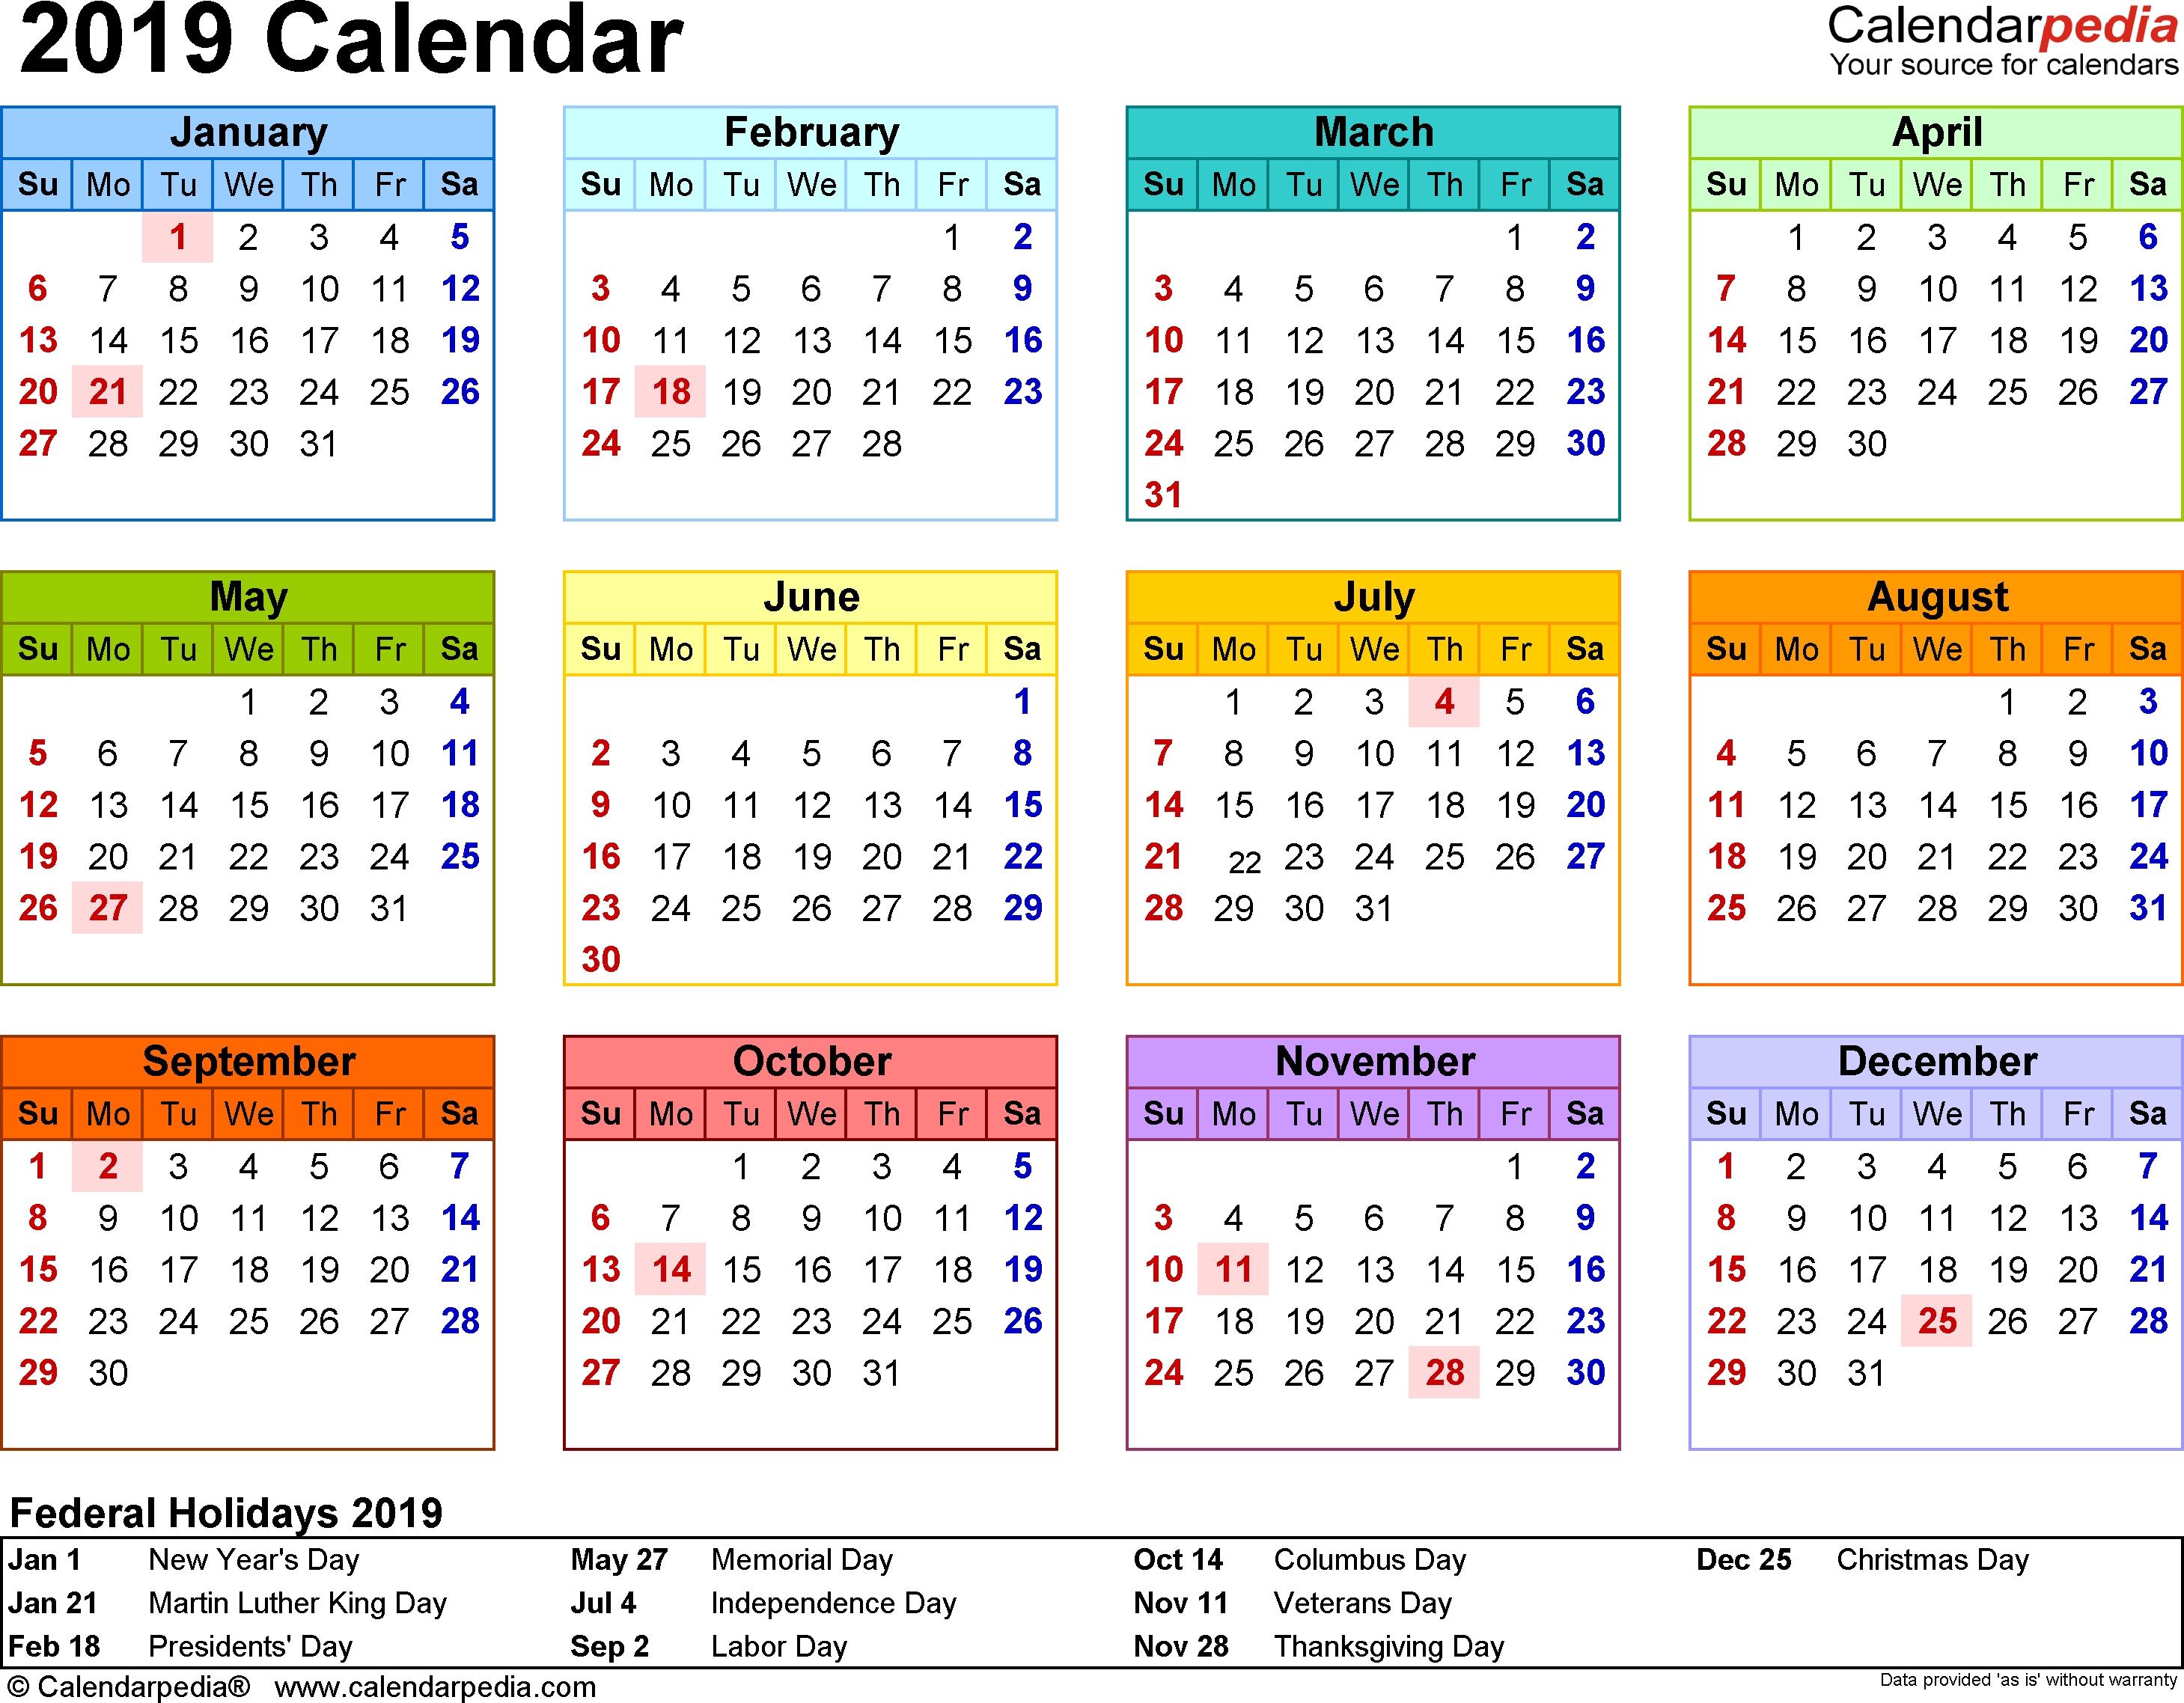 2019 Calendar Pdf - 17 Free Printable Calendar Templates